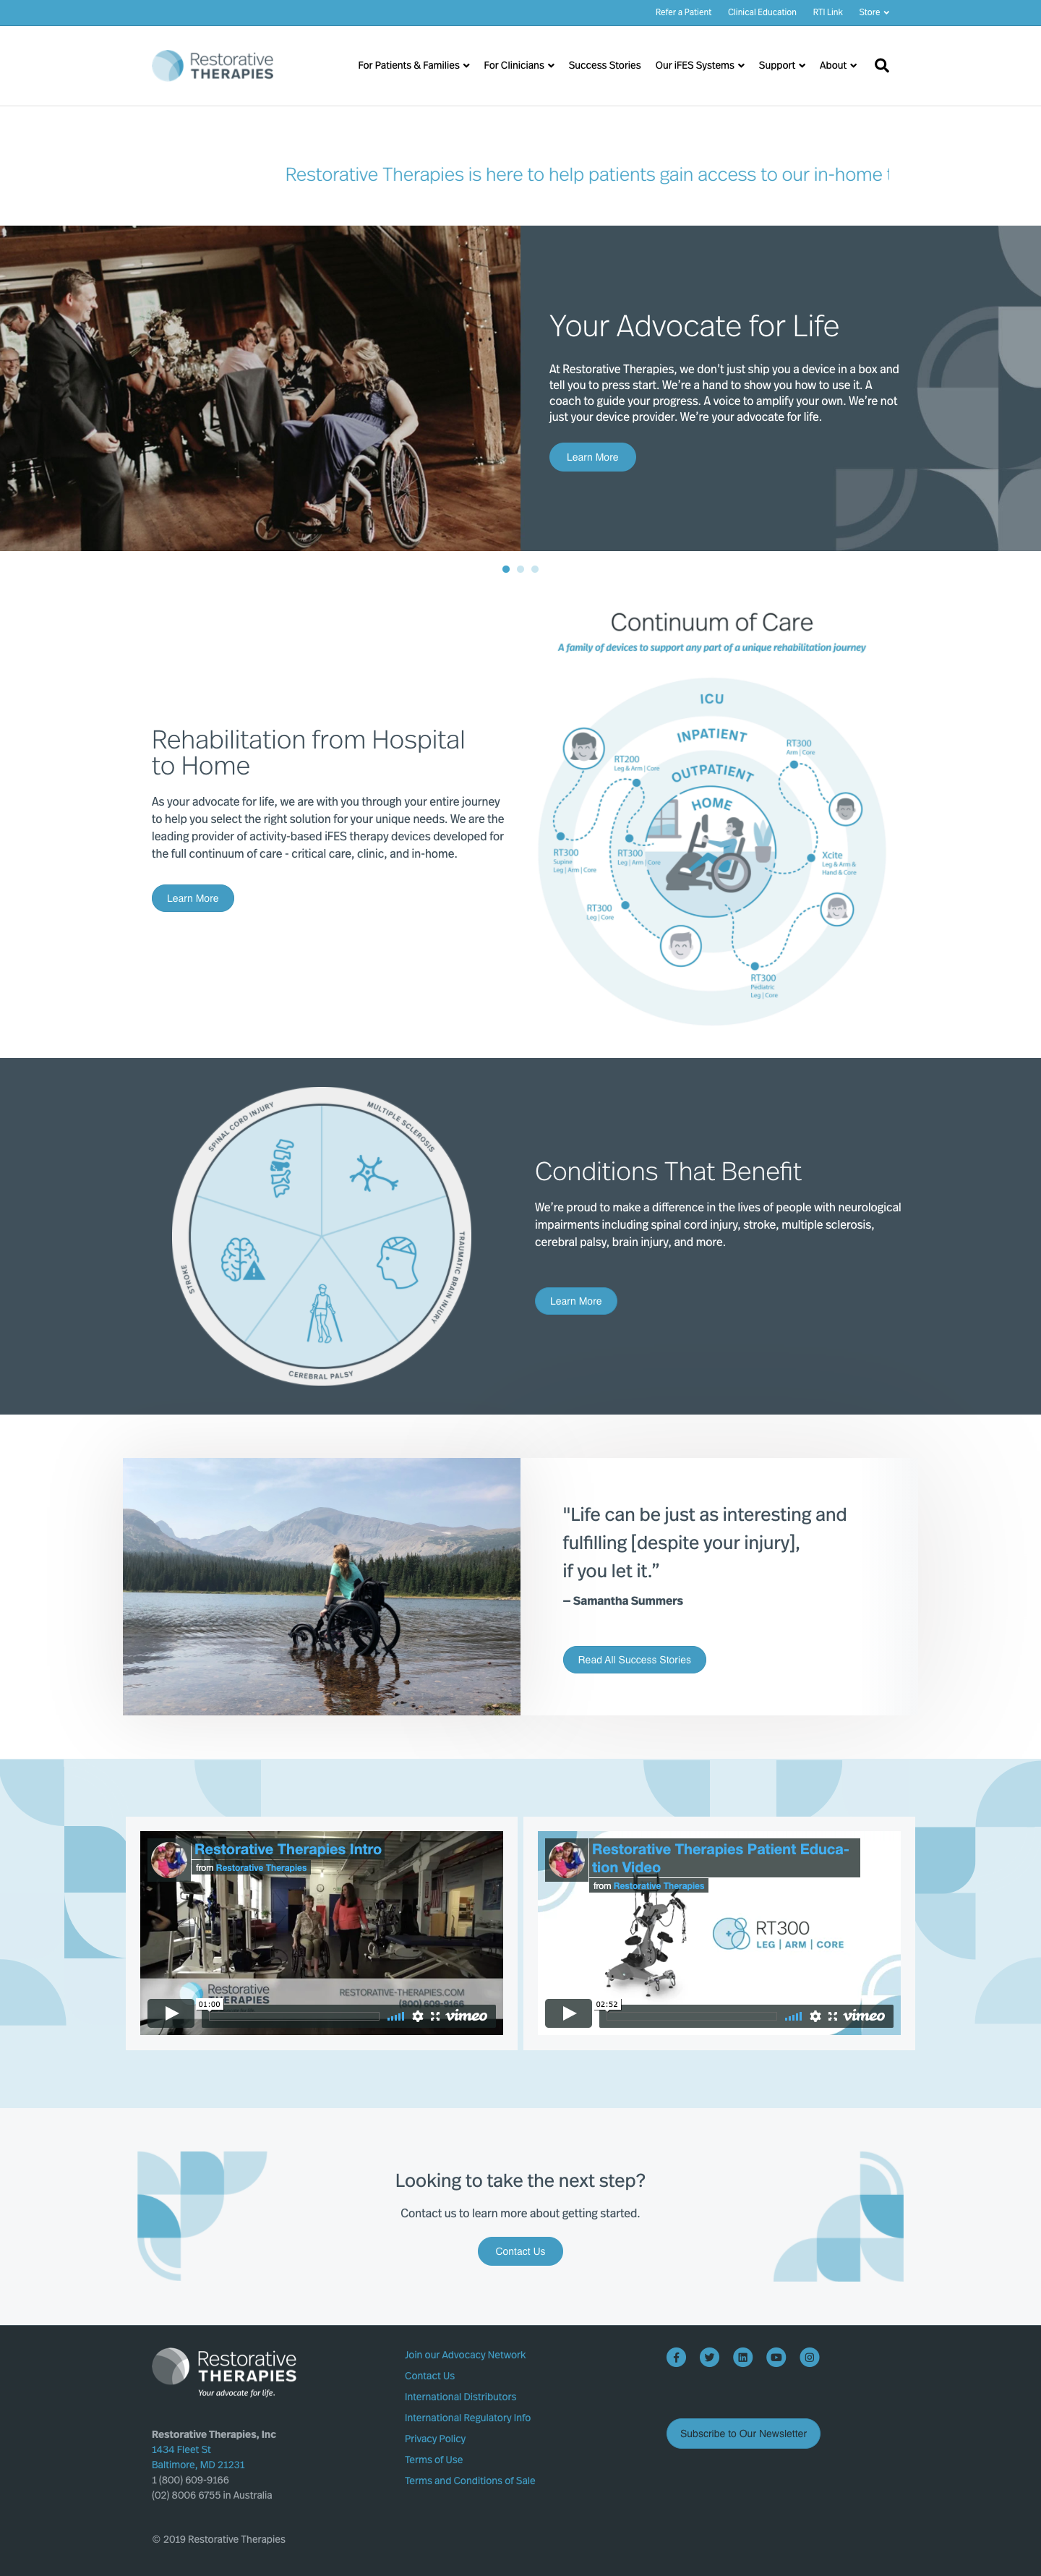 Restorative Therapies Website Redesign image